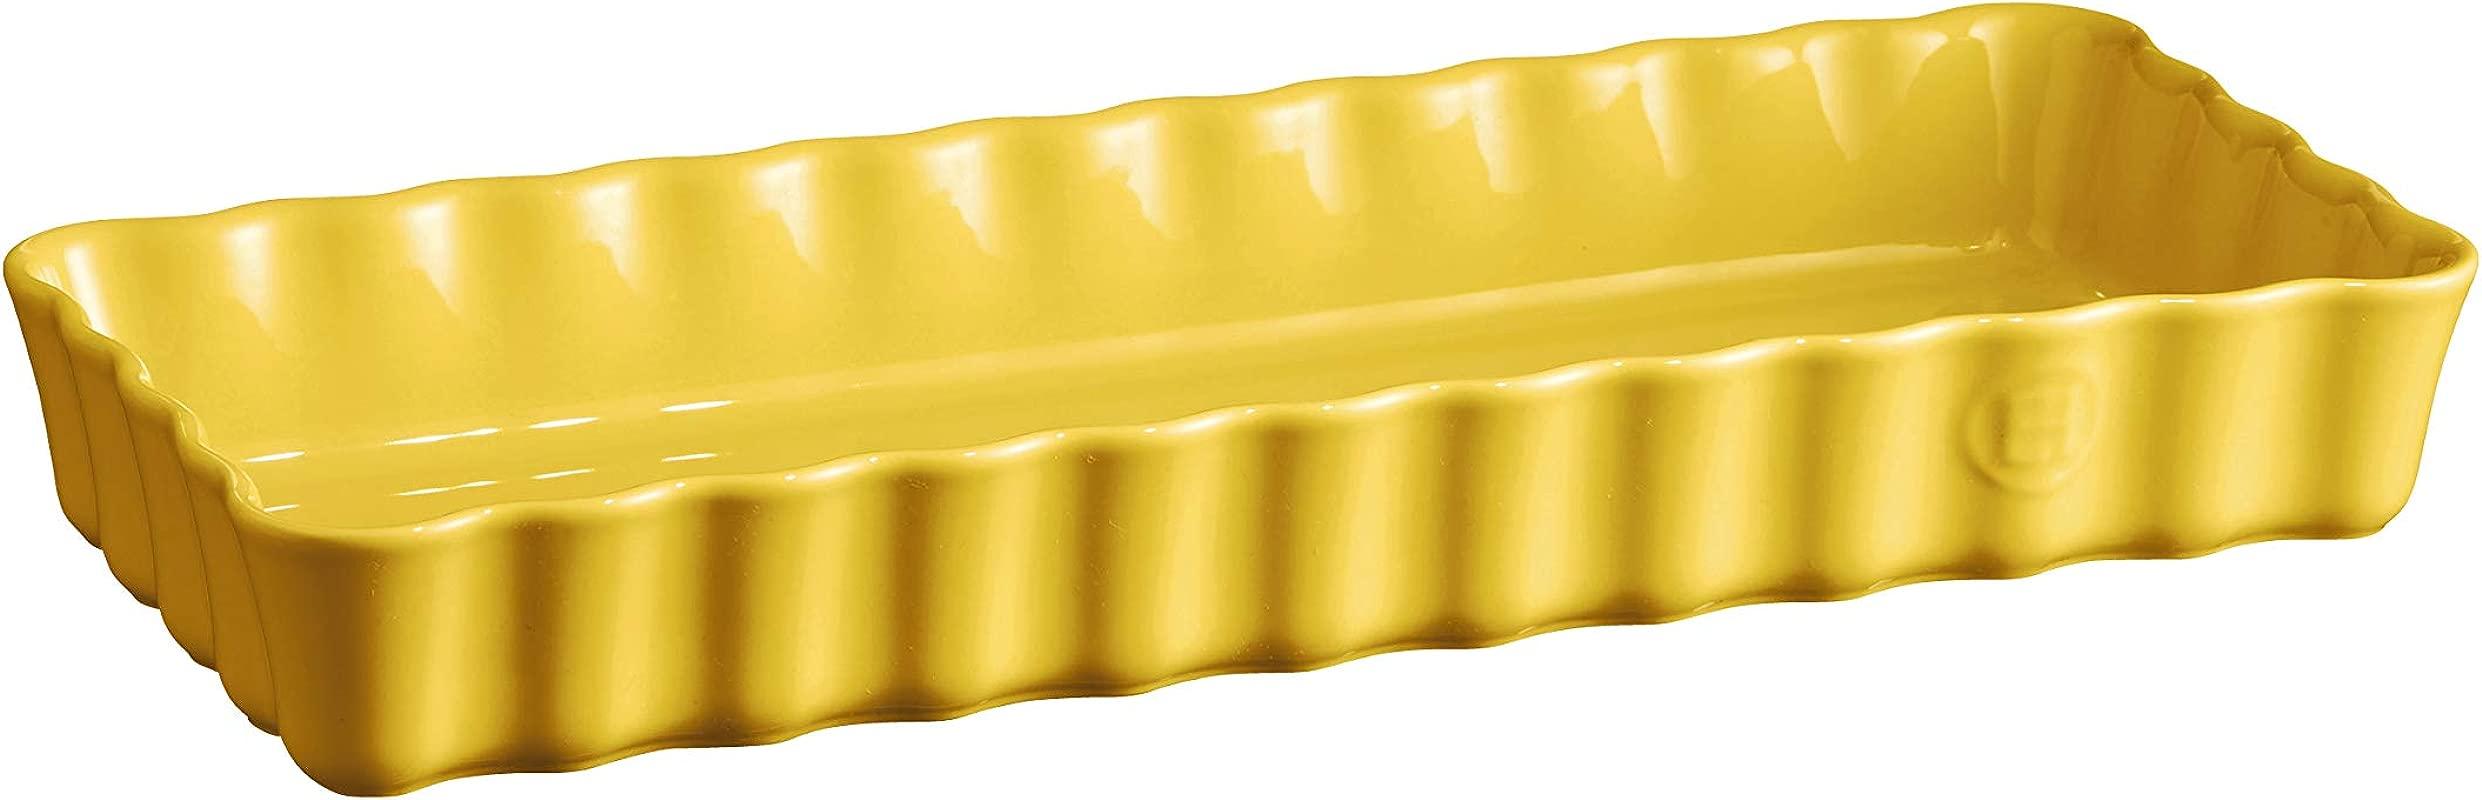 Emile Henry 906034 Small Provence Yellow Rectangular Tart Dish 1 7 Qt